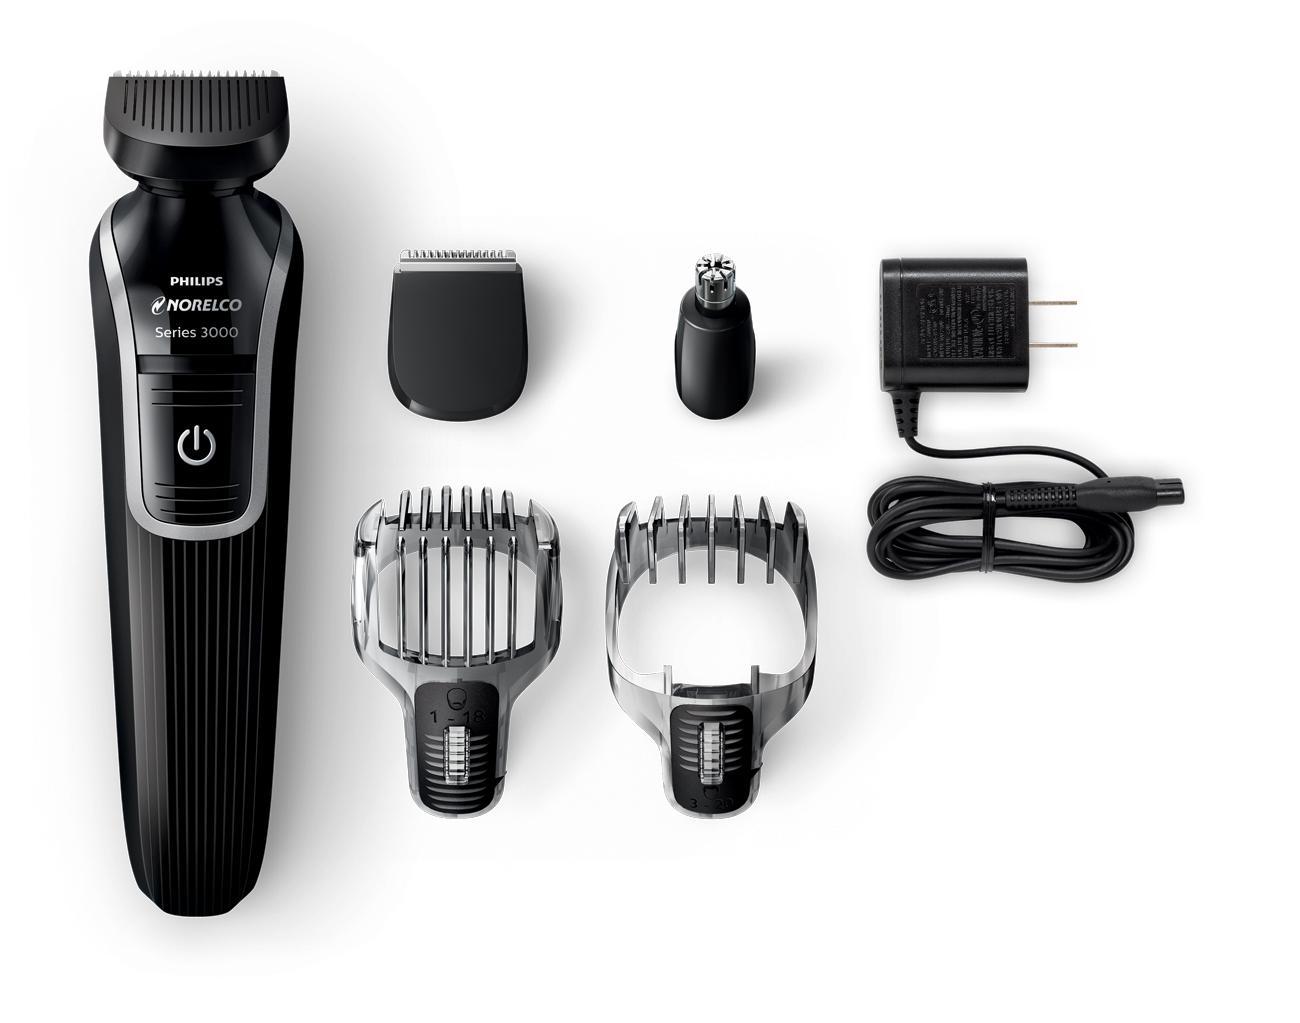 electric shaver philips norelco multigroom men trimmer facial hair clipper cut ebay. Black Bedroom Furniture Sets. Home Design Ideas